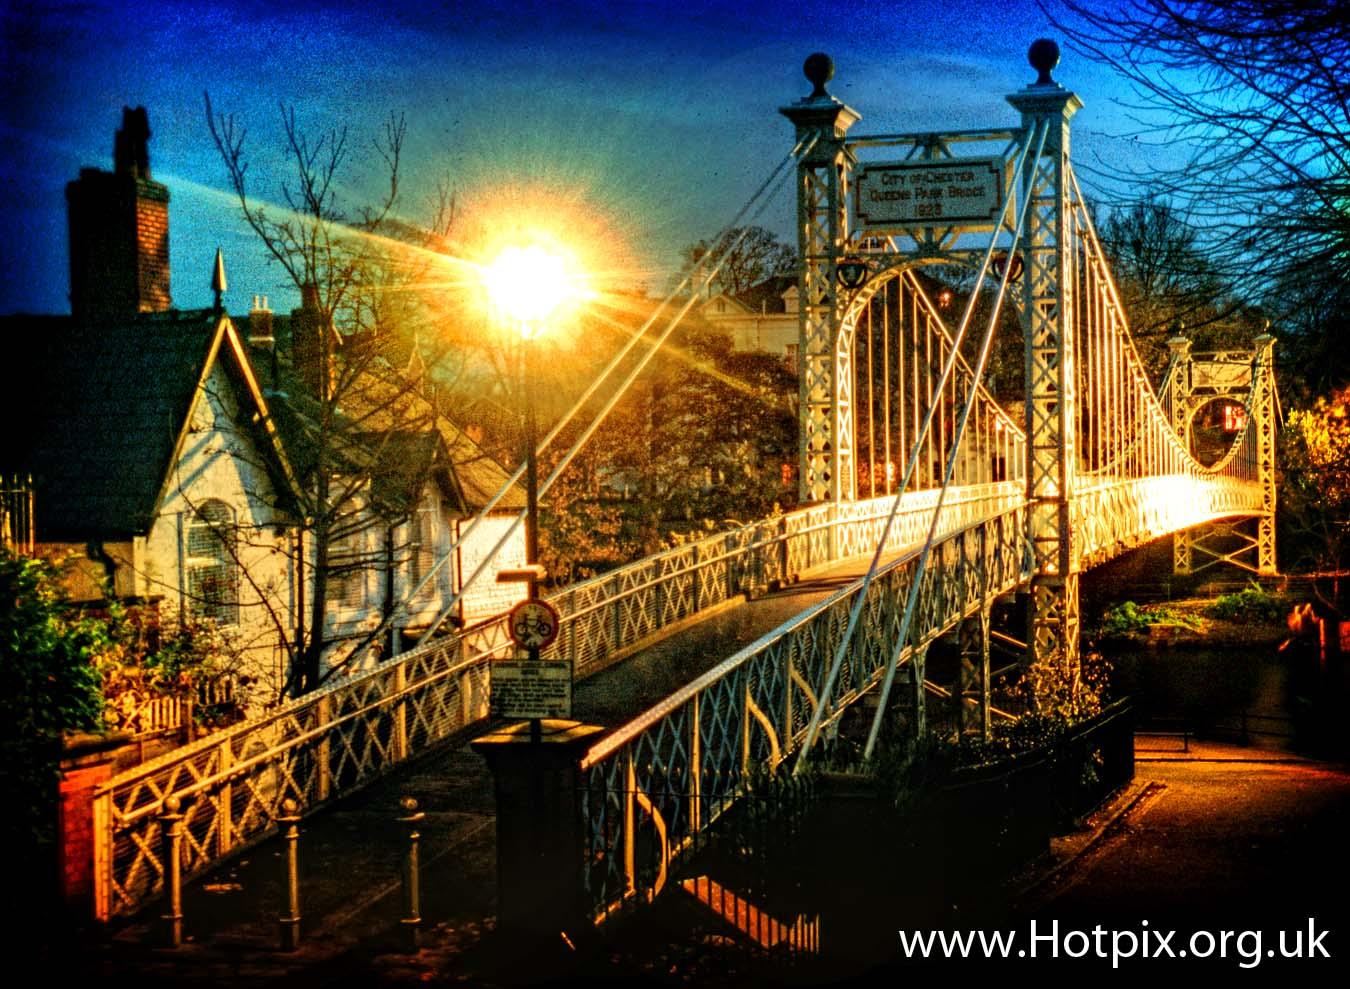 Chester,Cheshire,queenspark,queens,park,bridge,bbridge,foot,footbridge,cast,iron,steel,pedestrian,over,river,Dee,England,UK,GB,dusk,night,shot,blue,hour,bluehour,tonysmiththathousing,tonysmiththatithousing